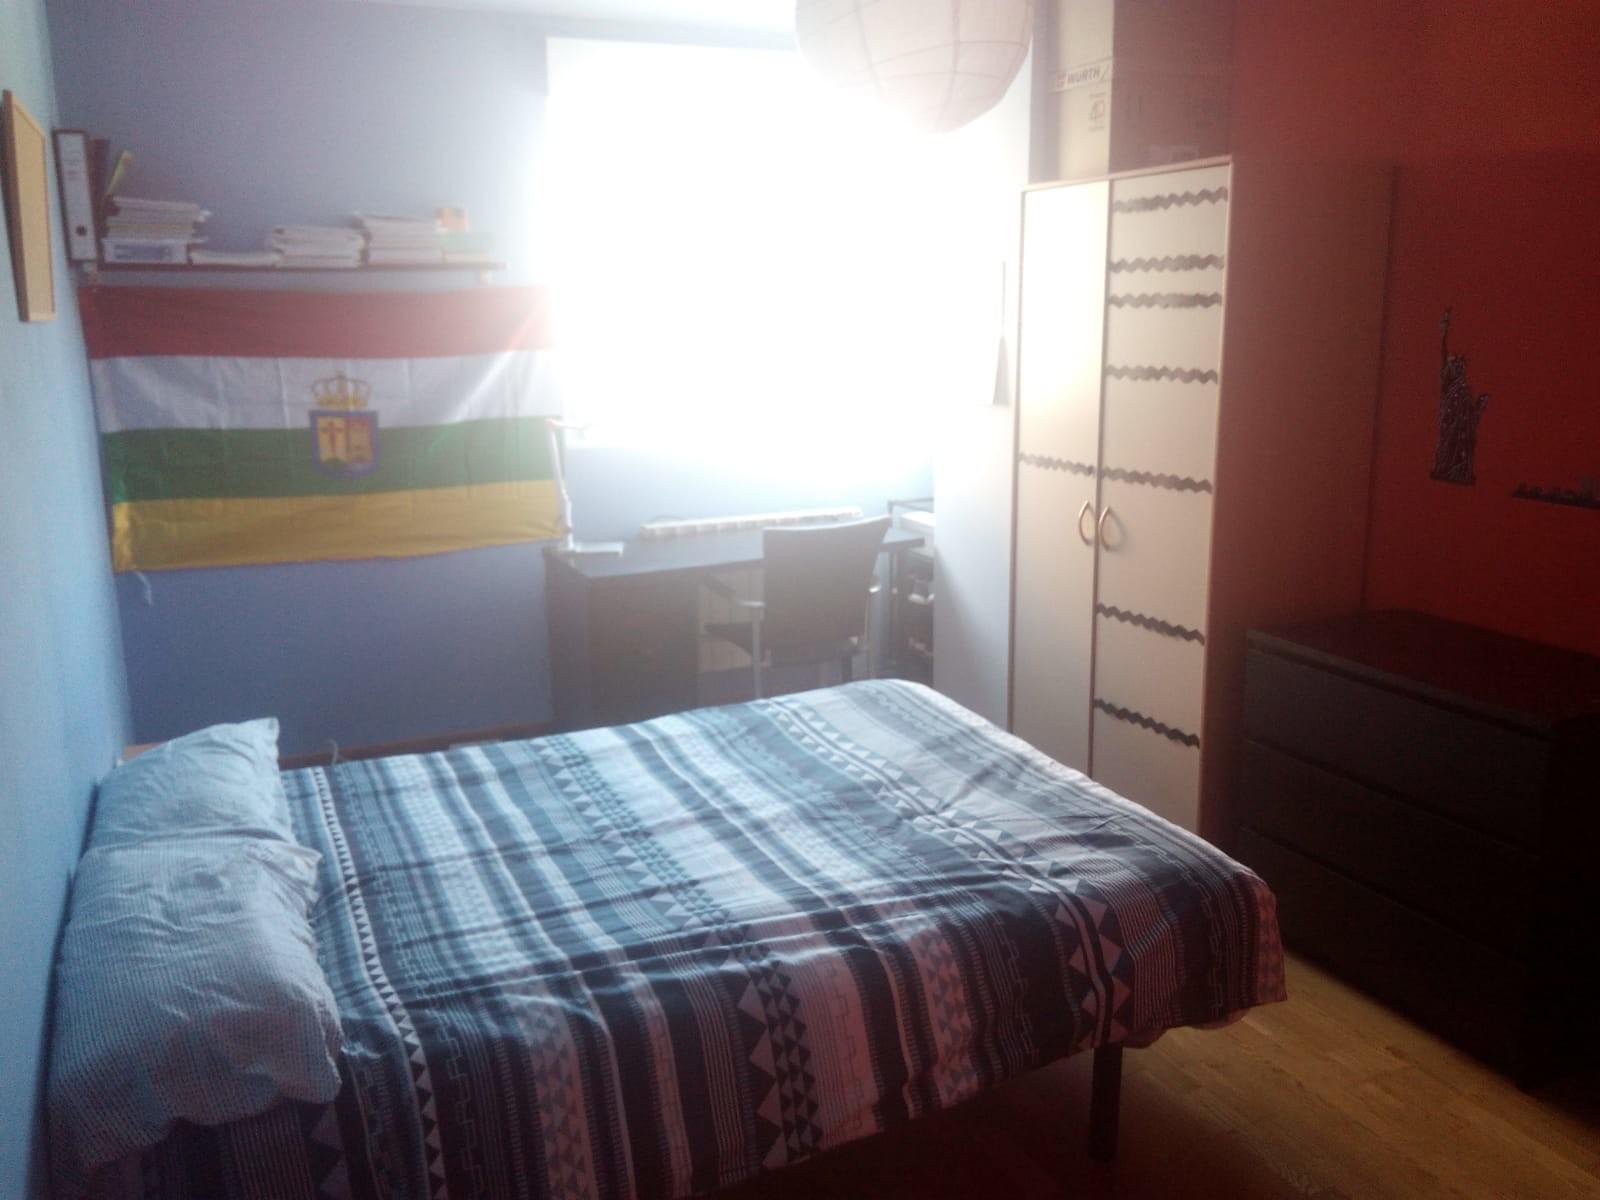 piso-amplio-luminoso-reformado-cerca-universidad-44933be3ee445d331d89e2dd95becae4